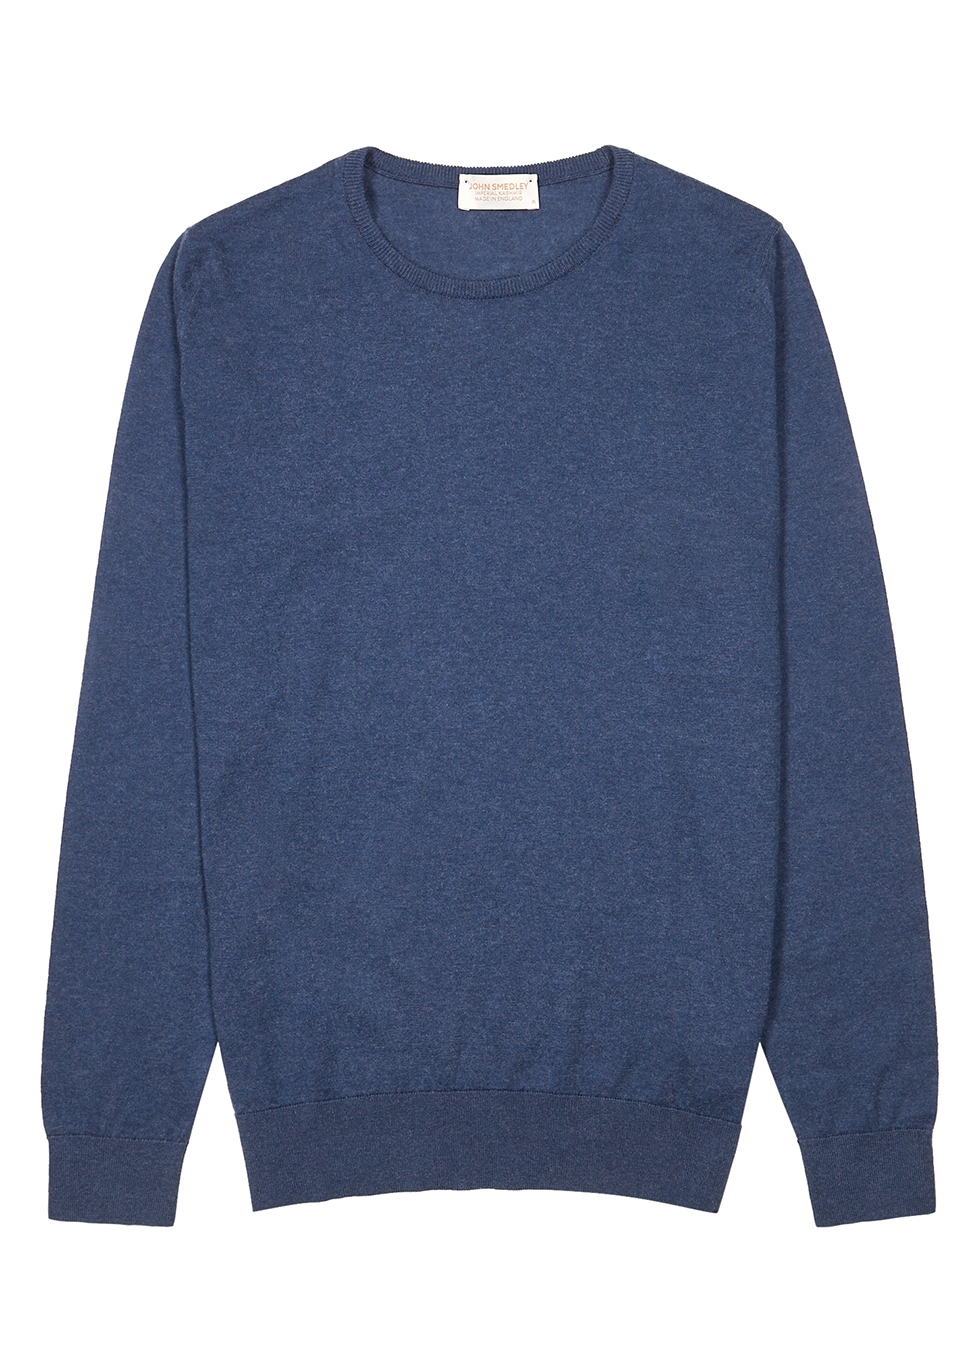 Theon navy cotton-blend jumper